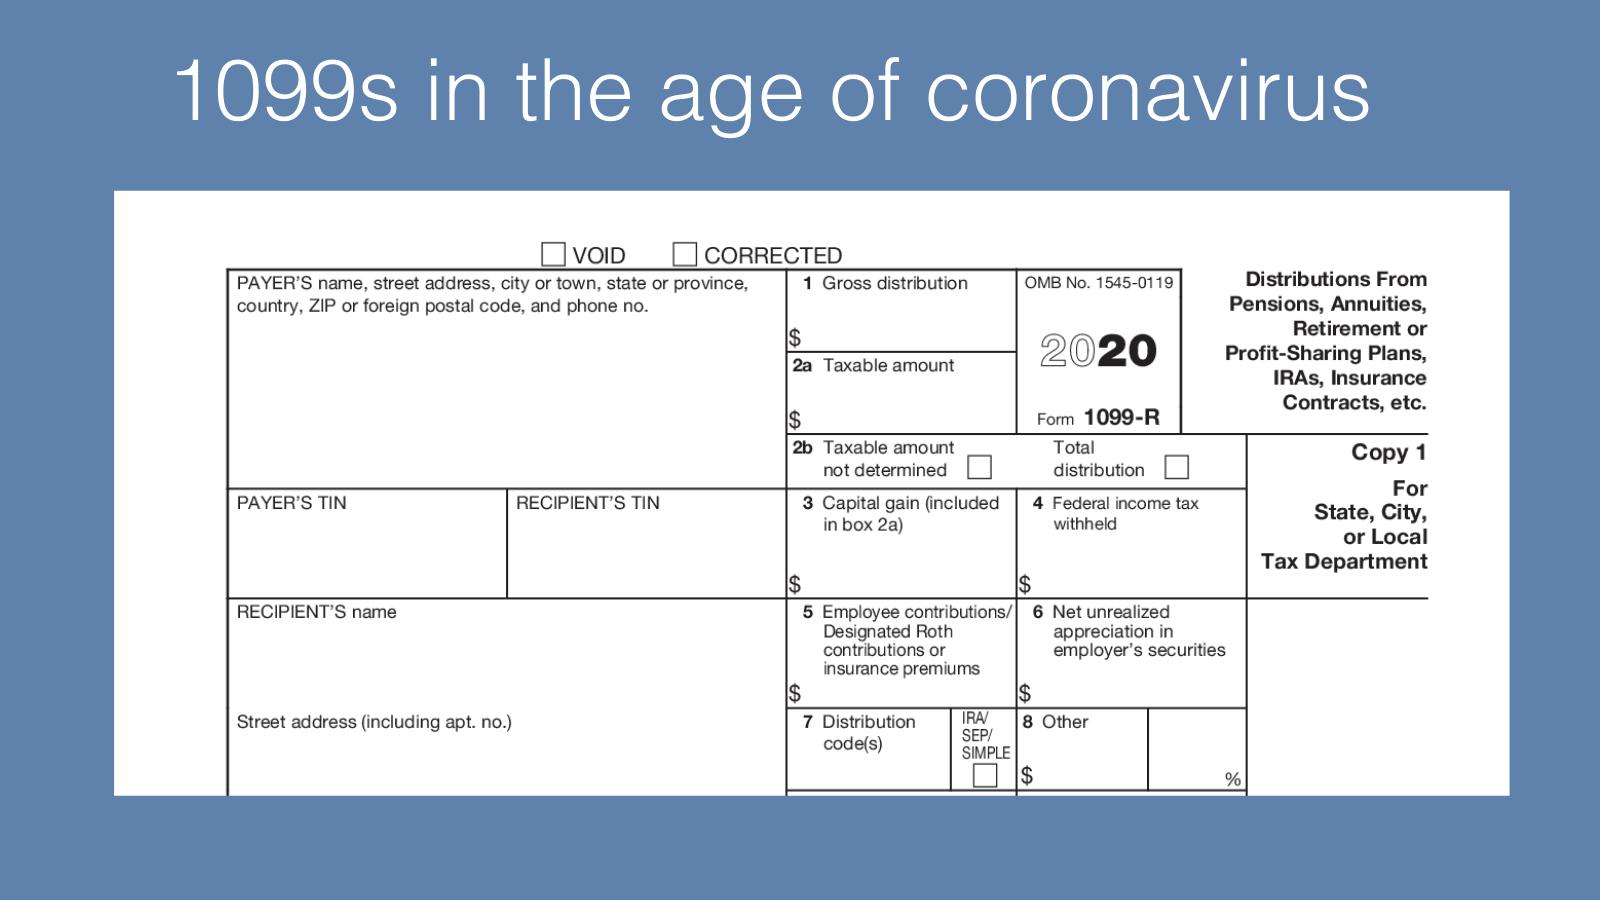 1099s in the age of coronavirus